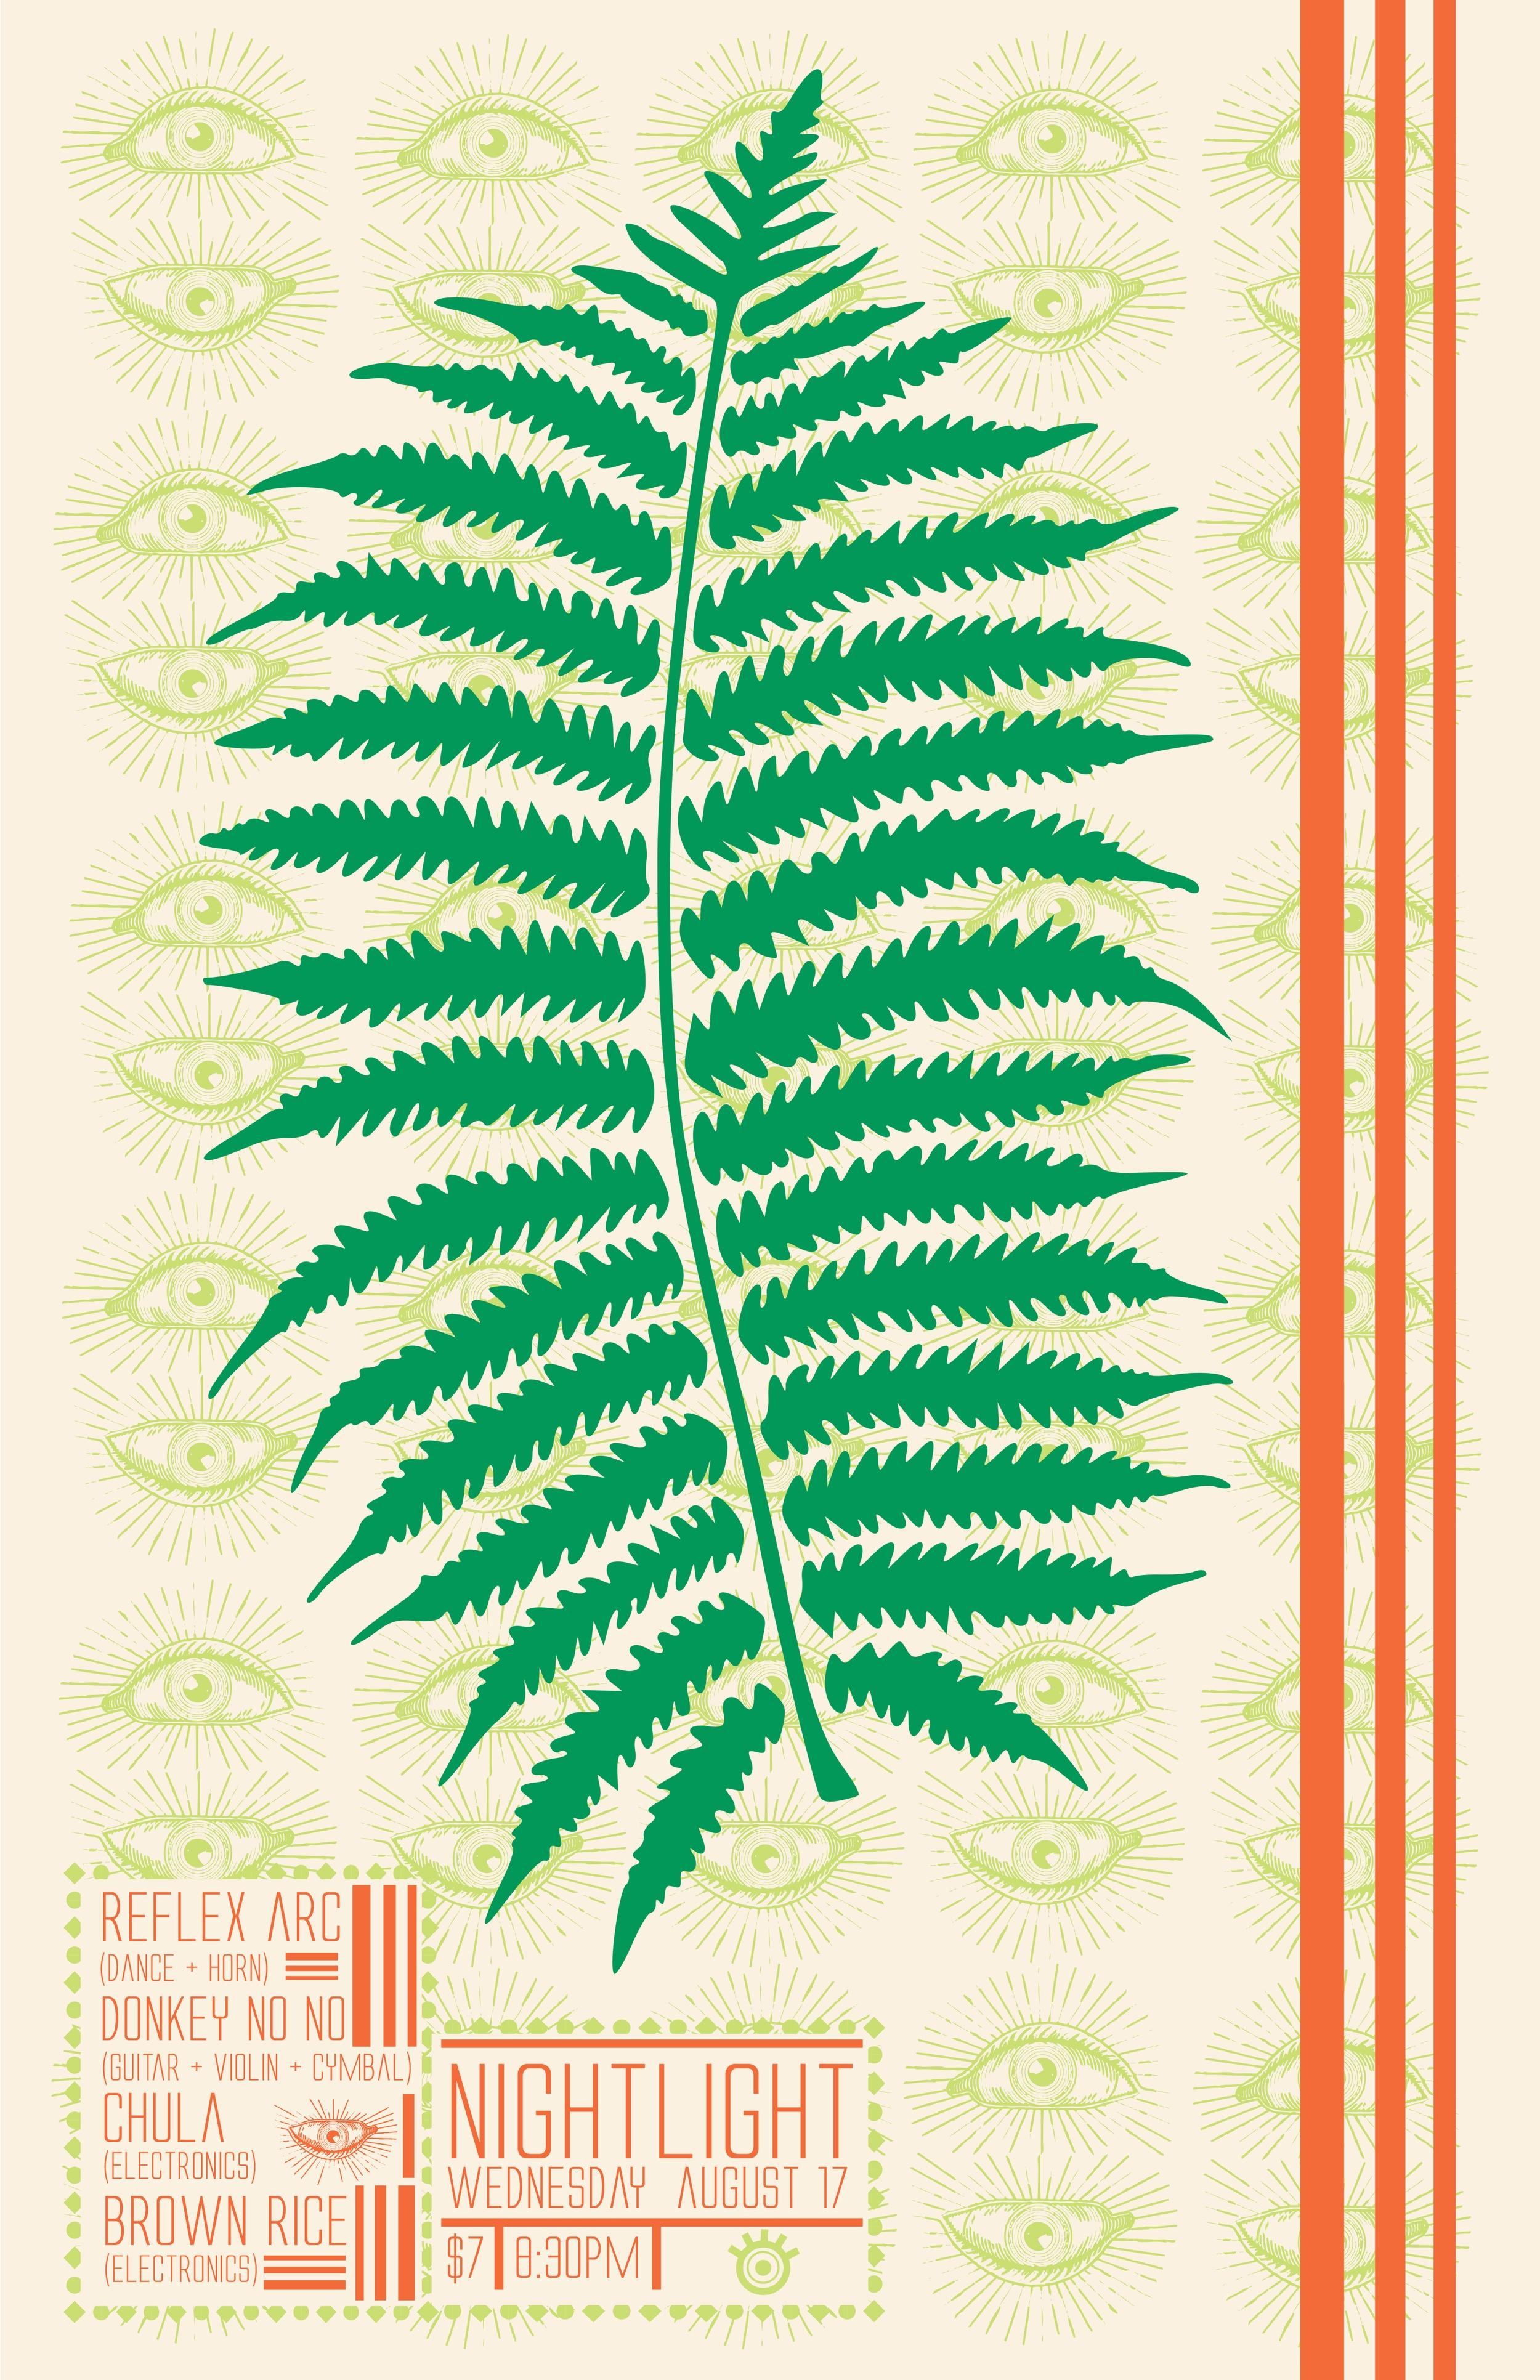 Brown Rice Poster.jpg